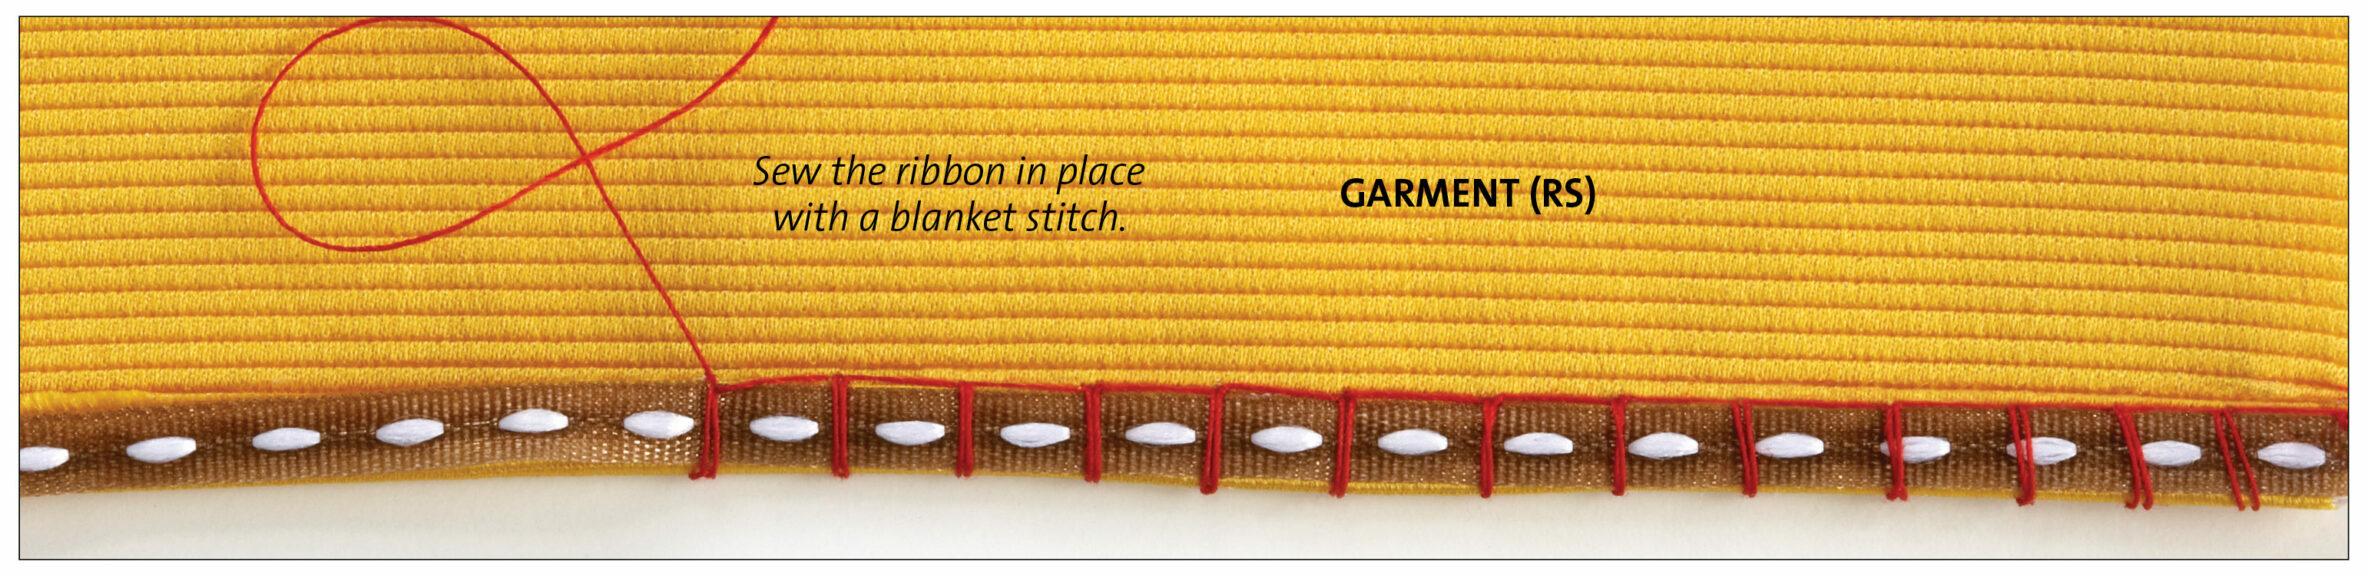 blanket stitch to sew ribbon